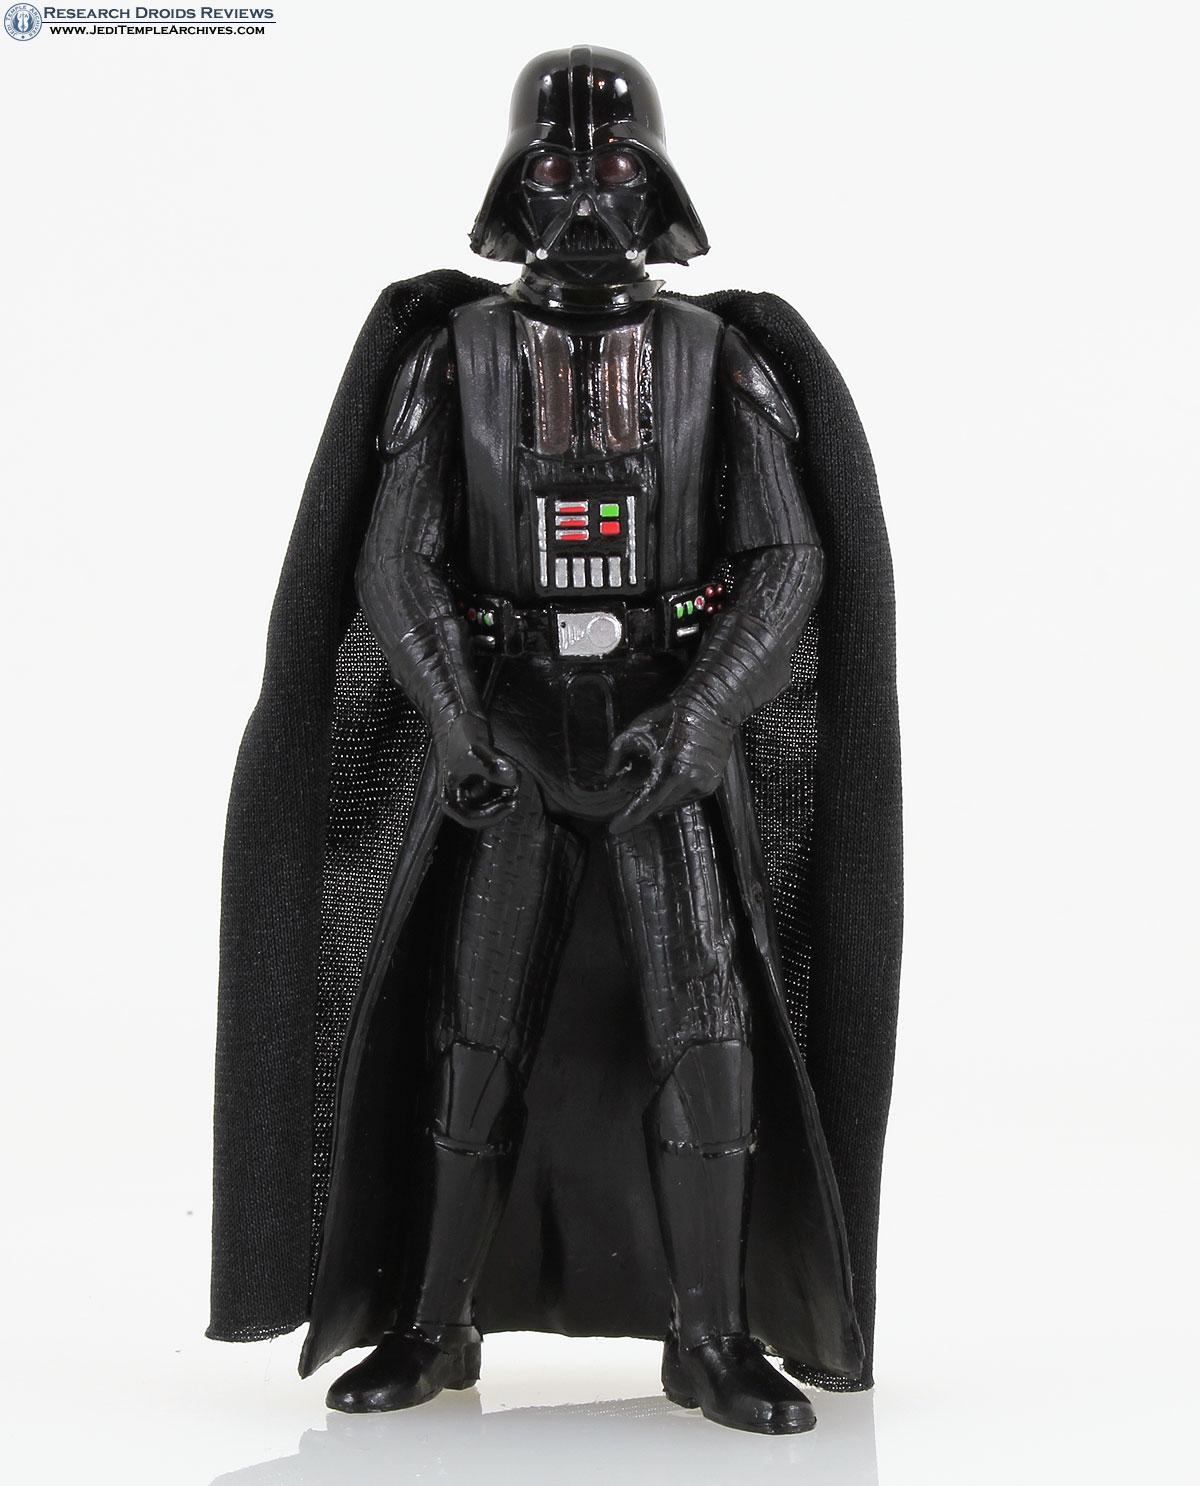 Darth Vader (Death Star Clash) -